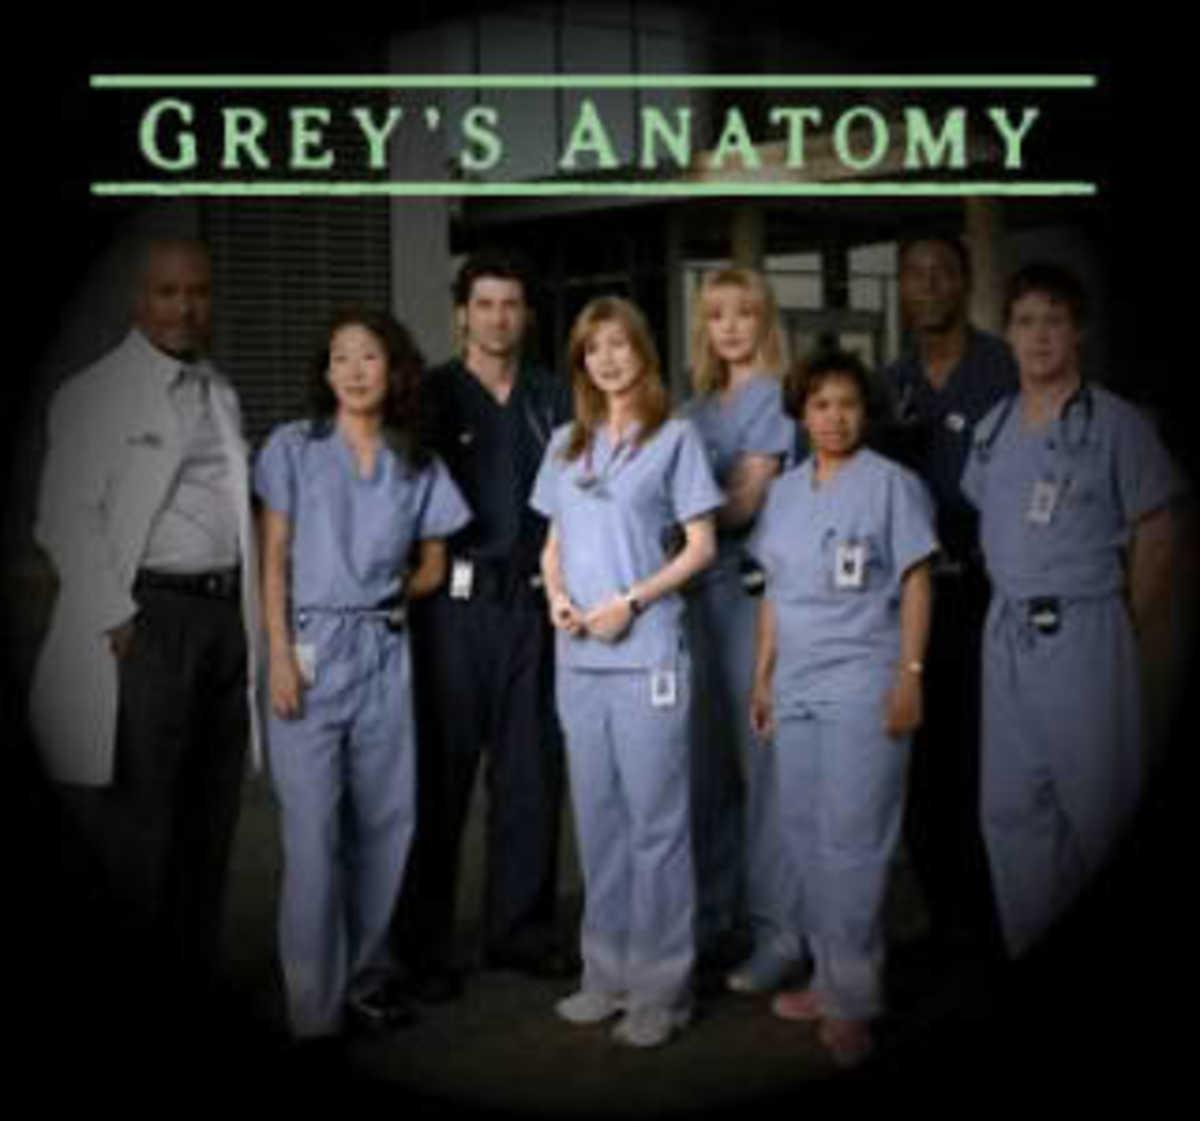 greys-anatomy-season-5-episode-12